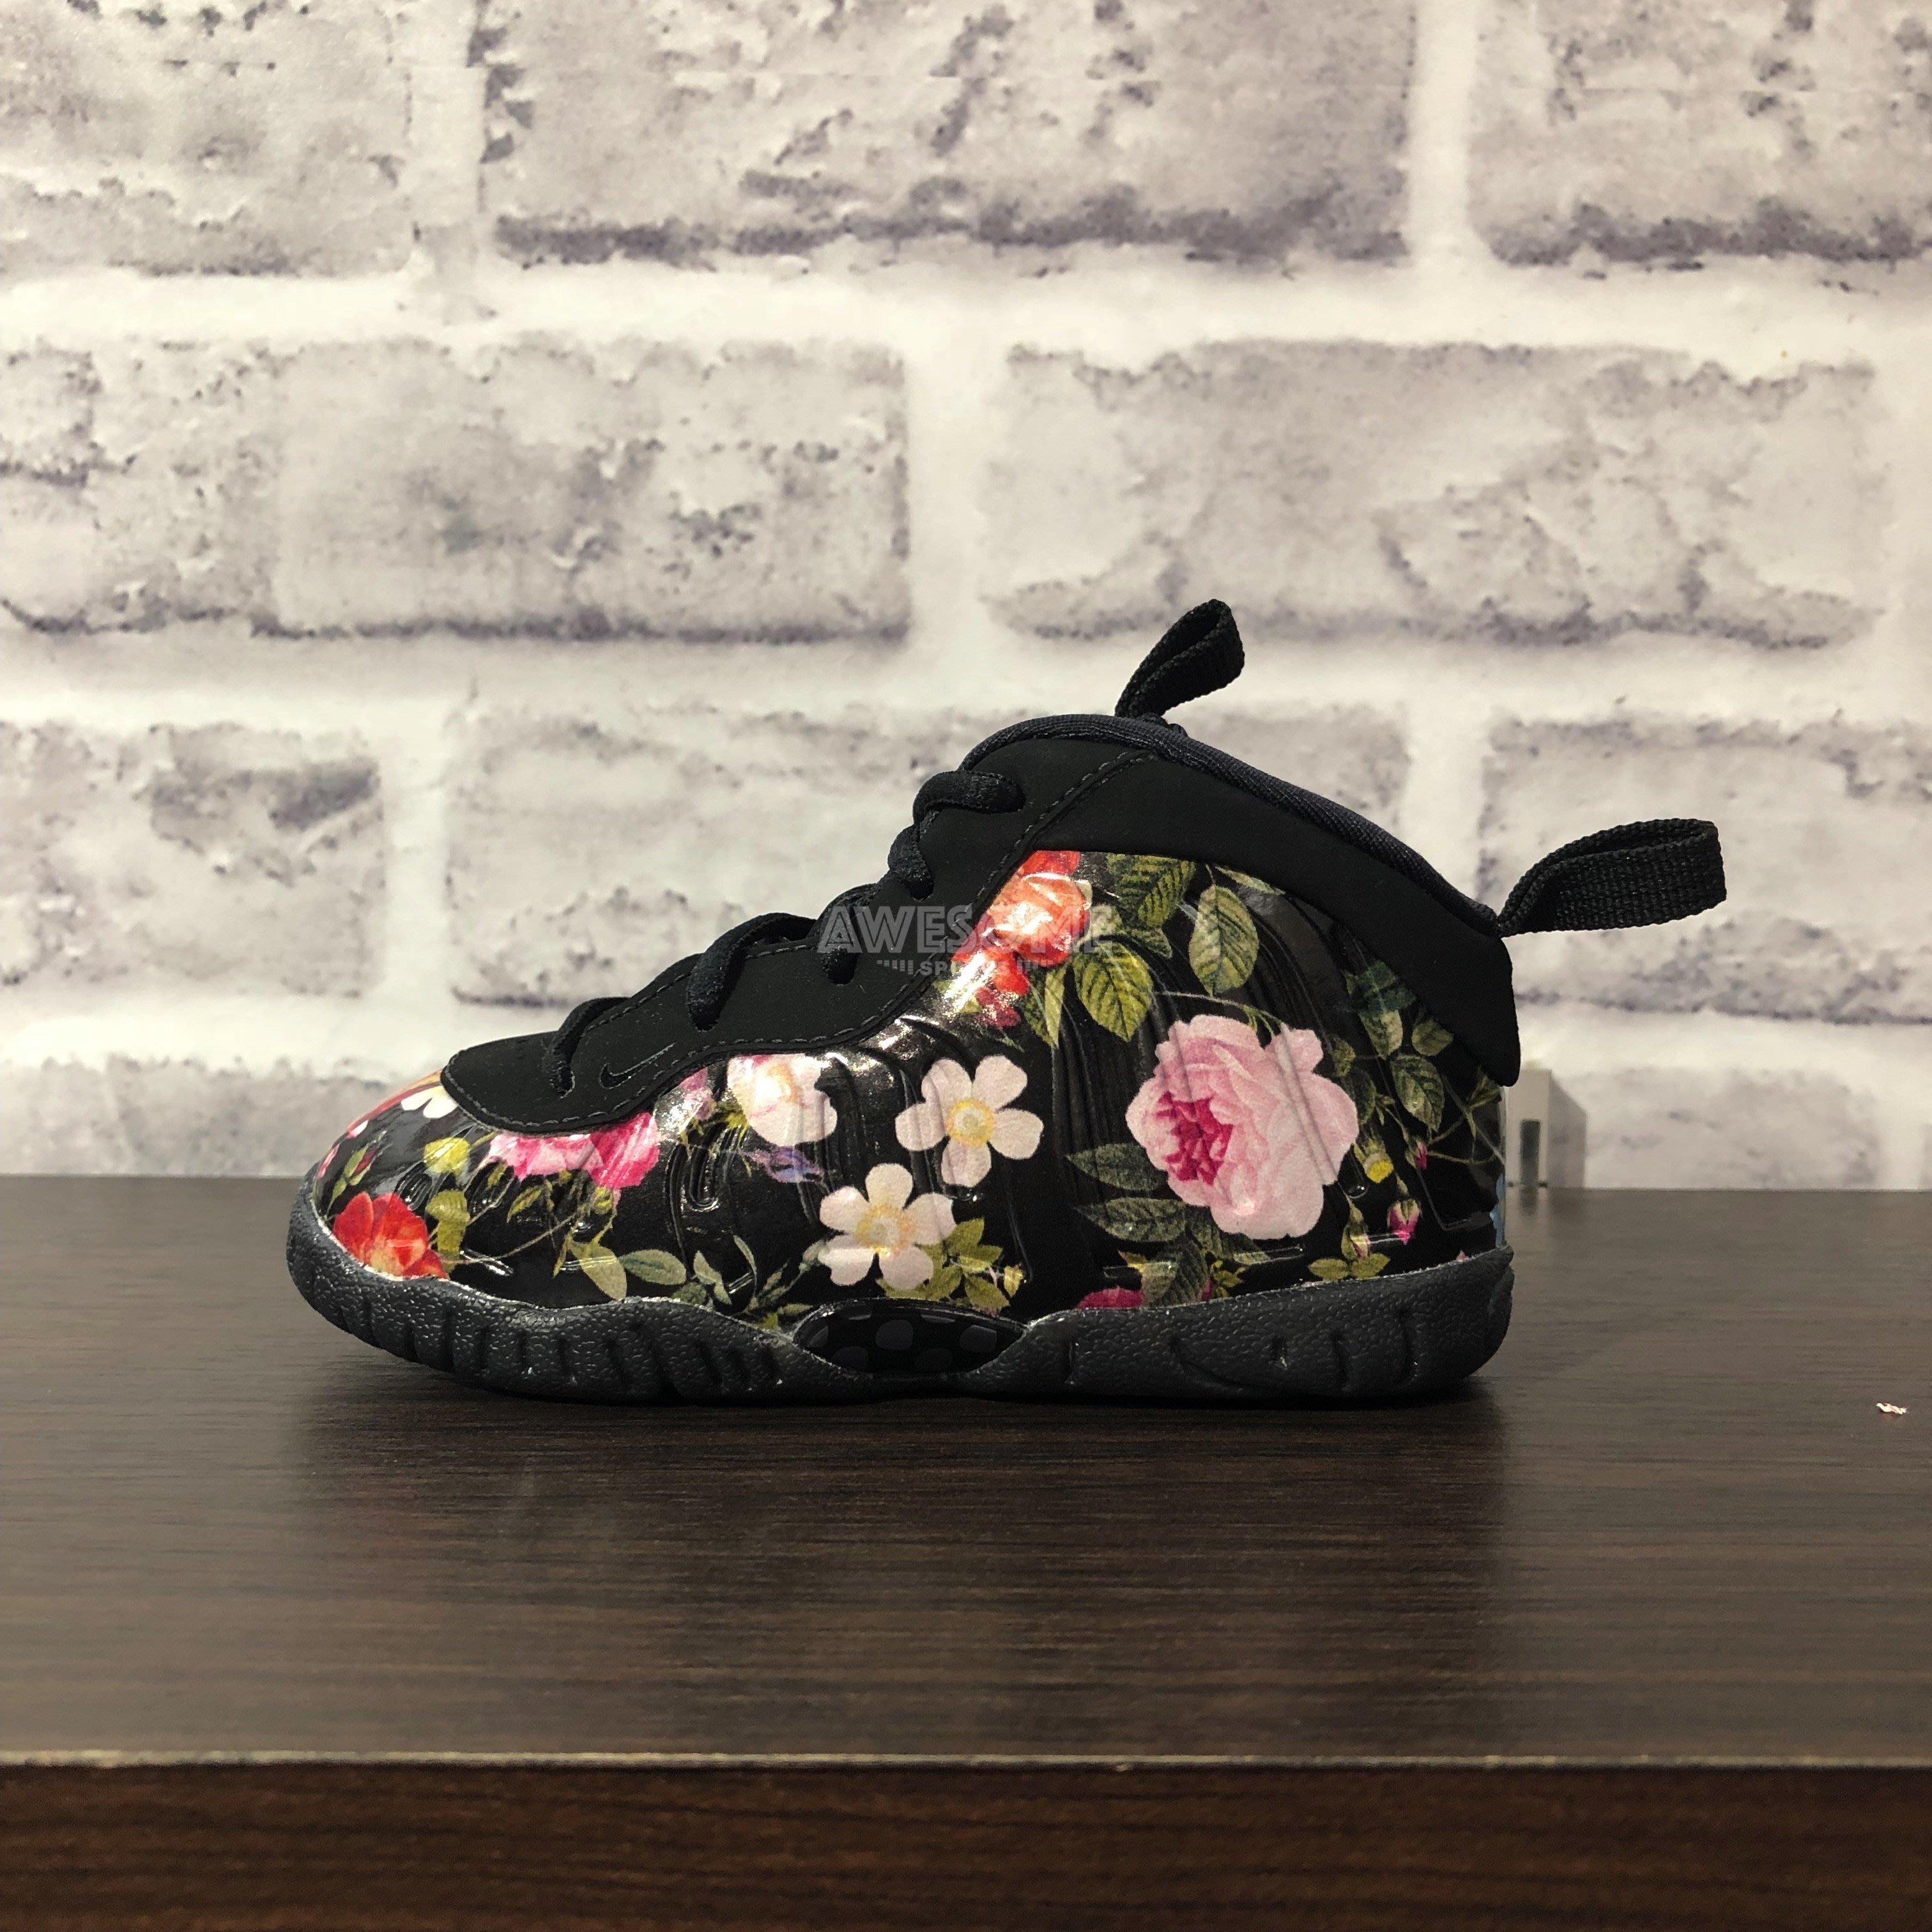 timeless design b6159 1136d  歐鉉 NIKE LITTLE POSITE ONE PRM TD Floral 花卉太空鞋AT8250-001